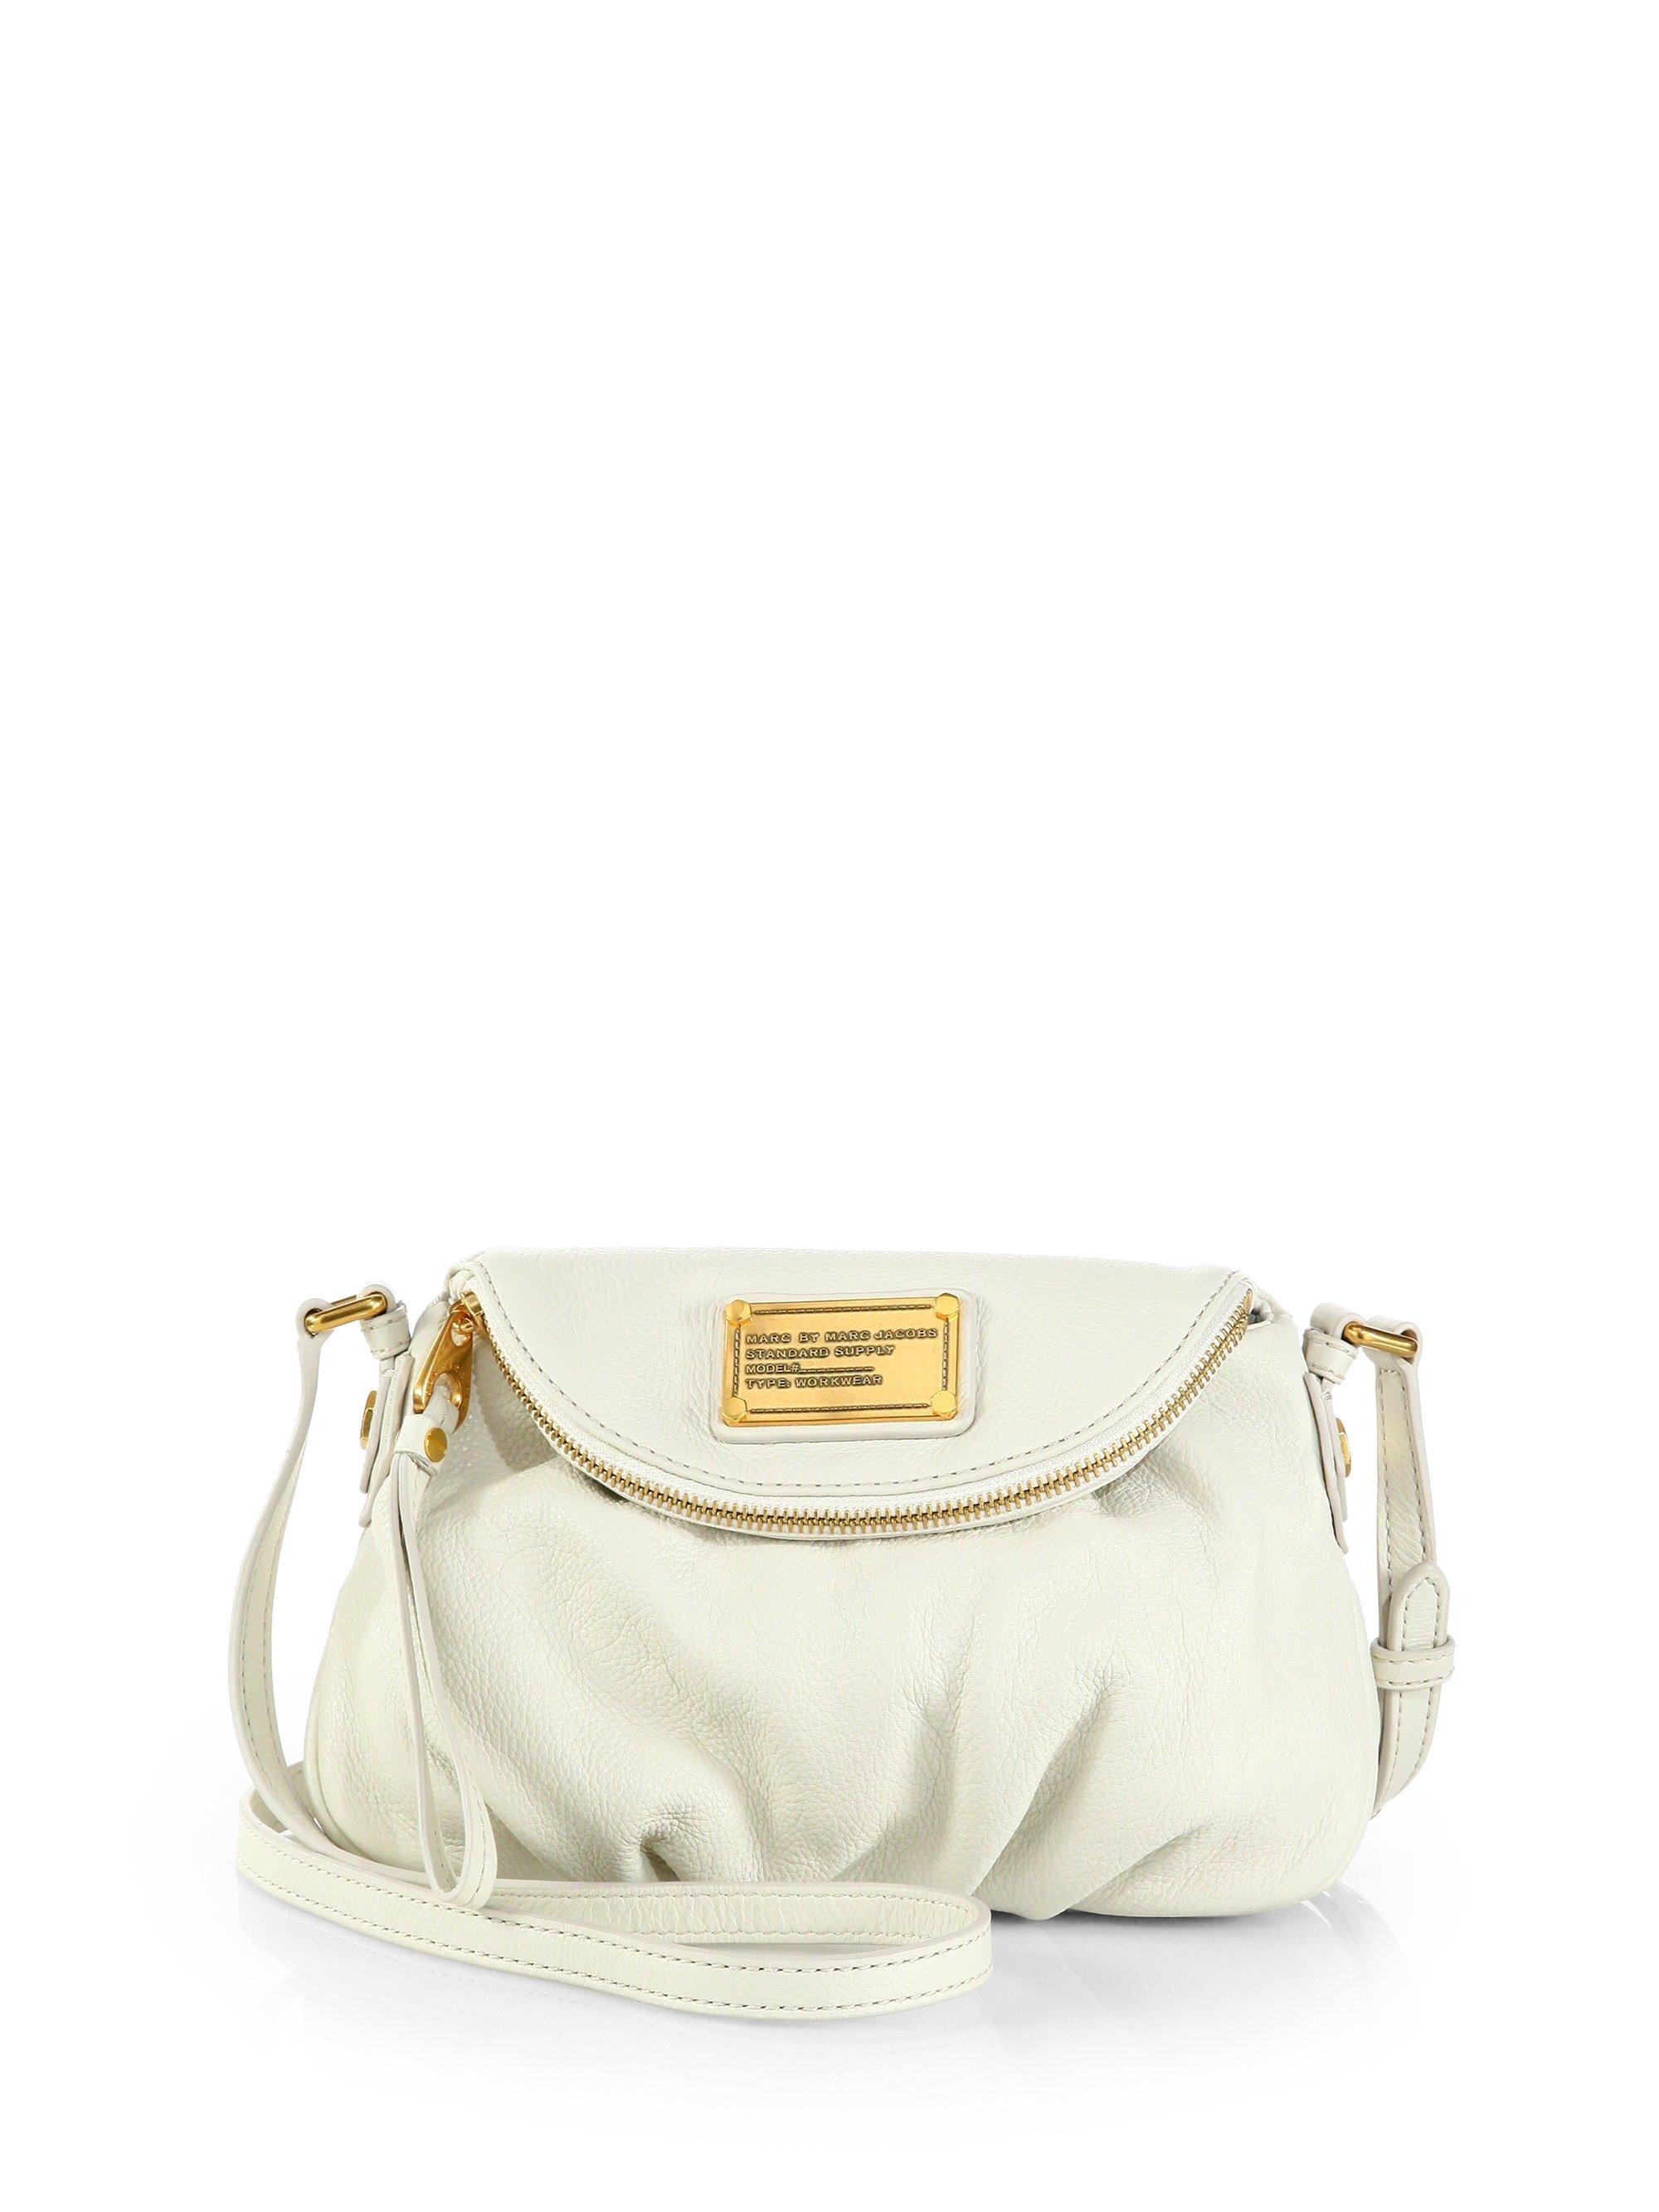 a7c41dcd7dd Marc By Marc Jacobs Classic Q Mini Natasha Crossbody Bag in White - Lyst